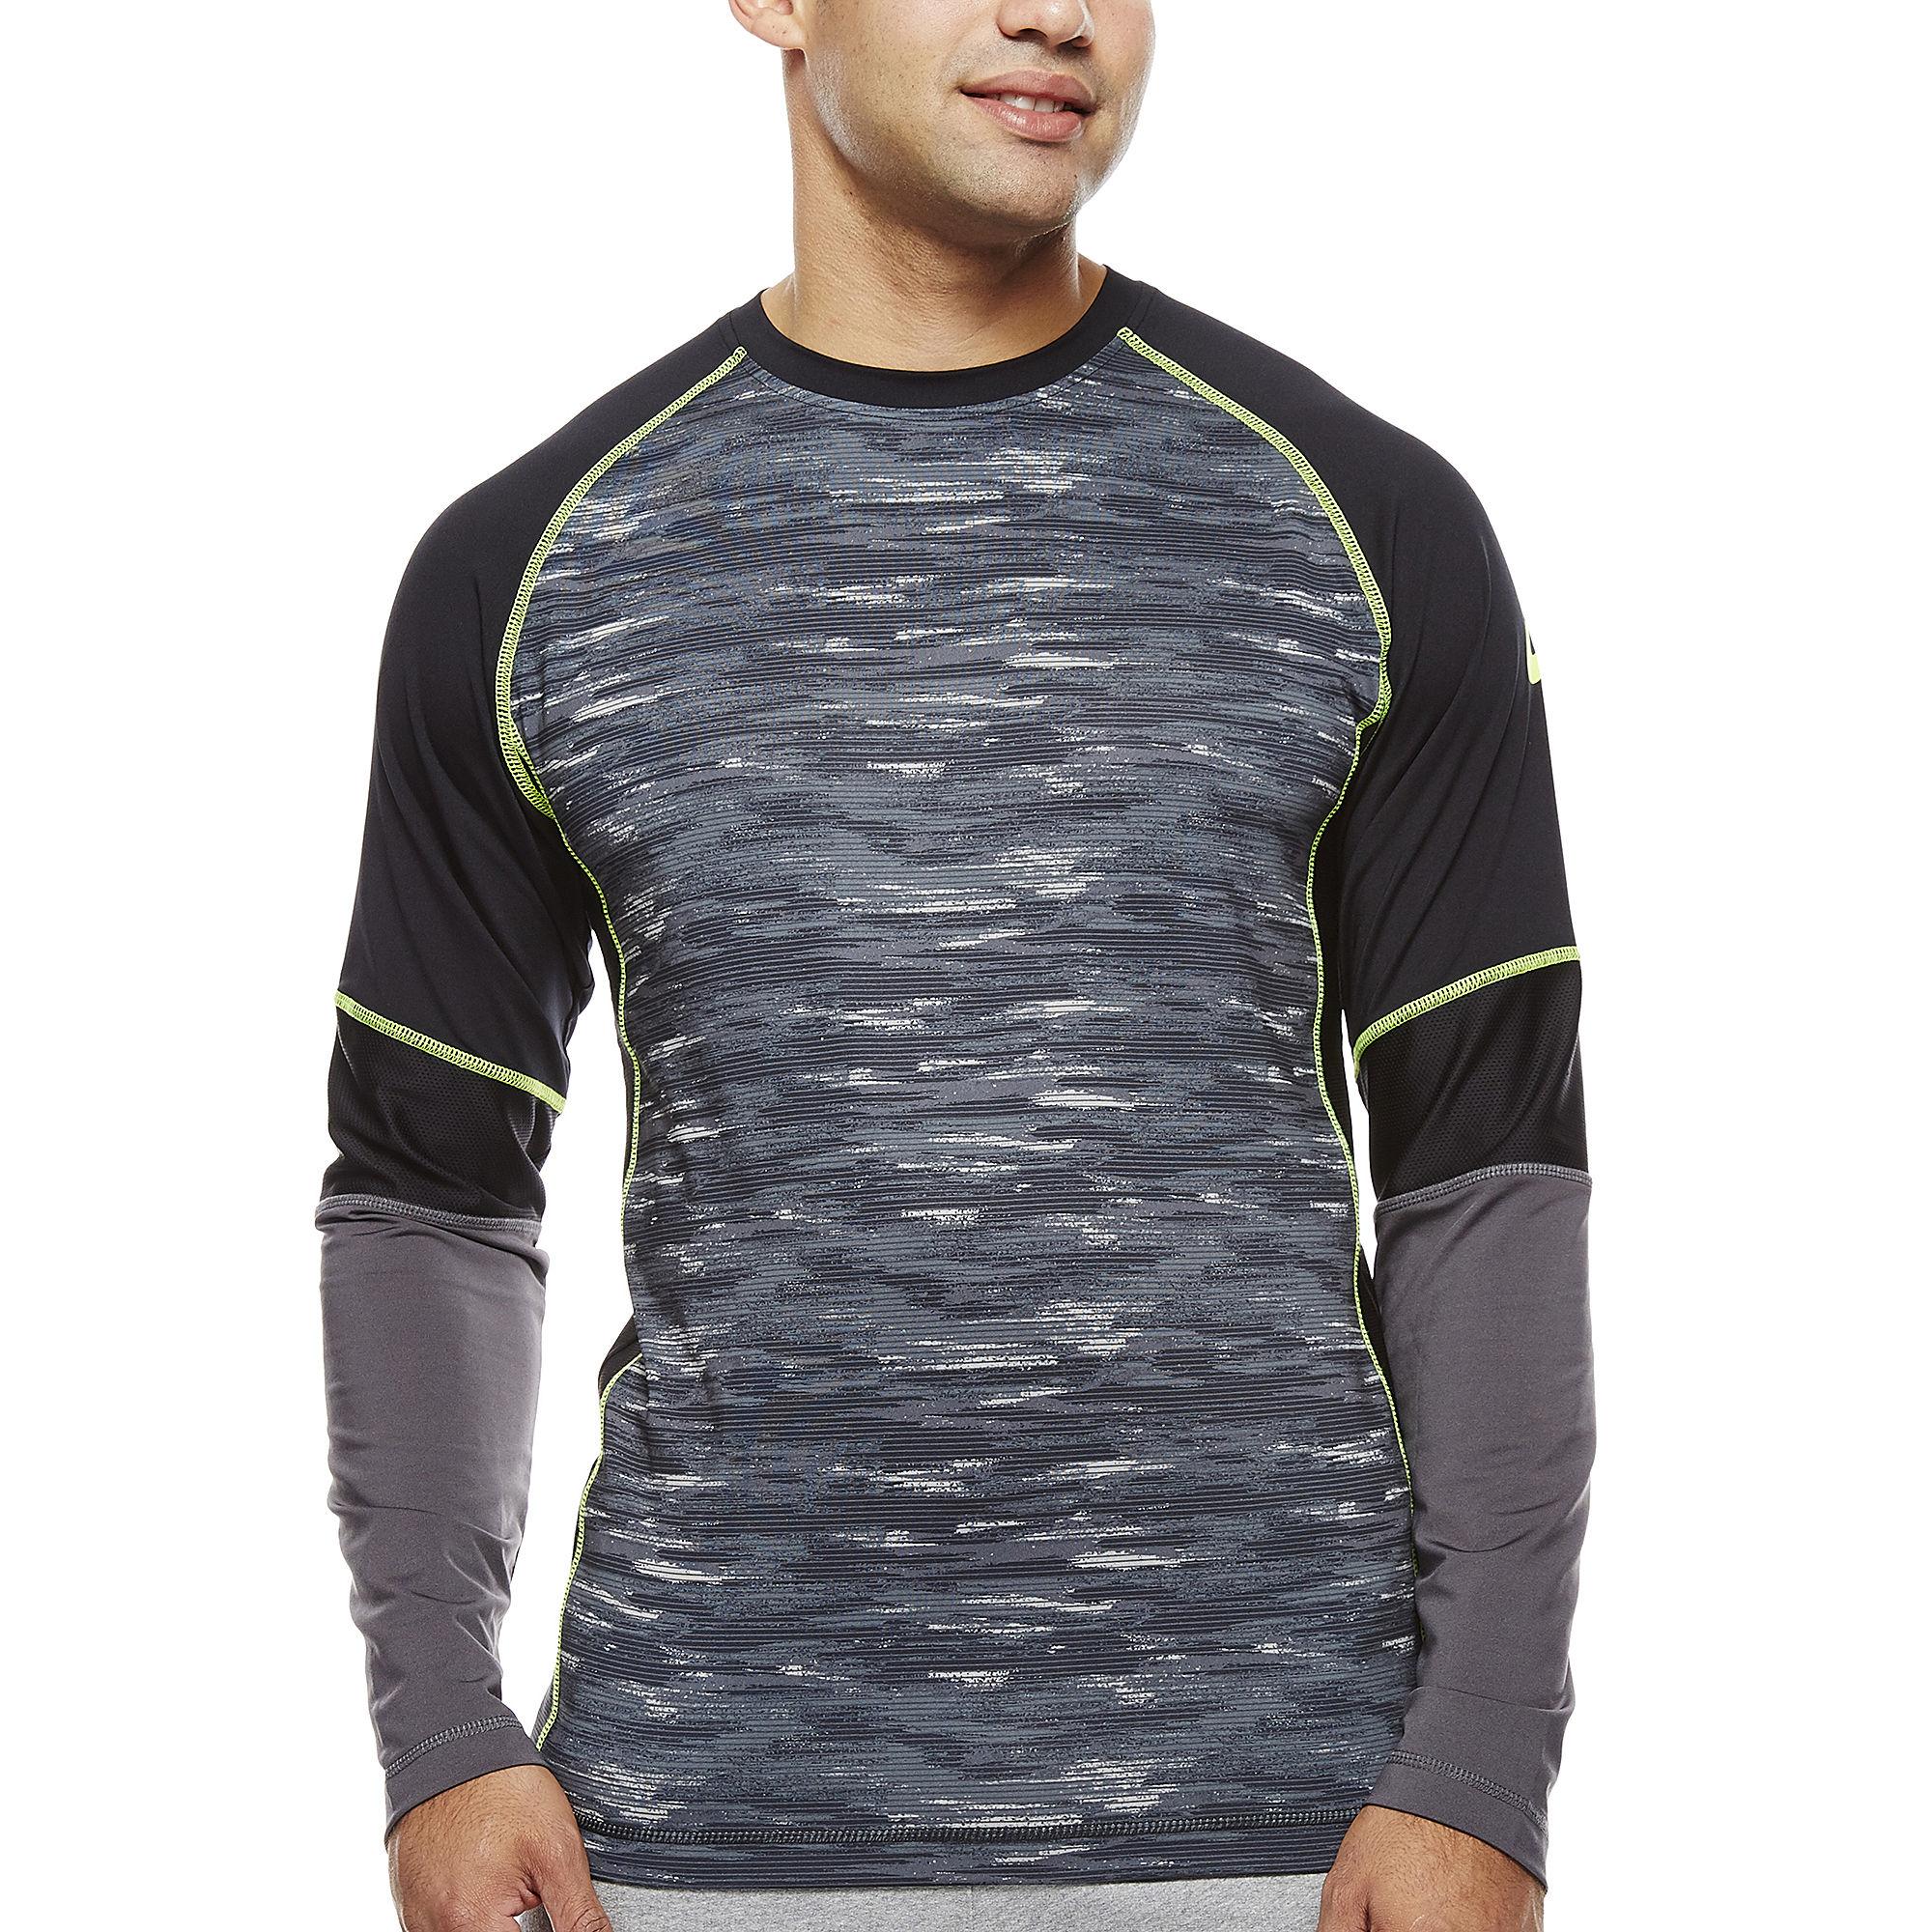 Asics Camo Show-Off Long-Sleeve Shirt